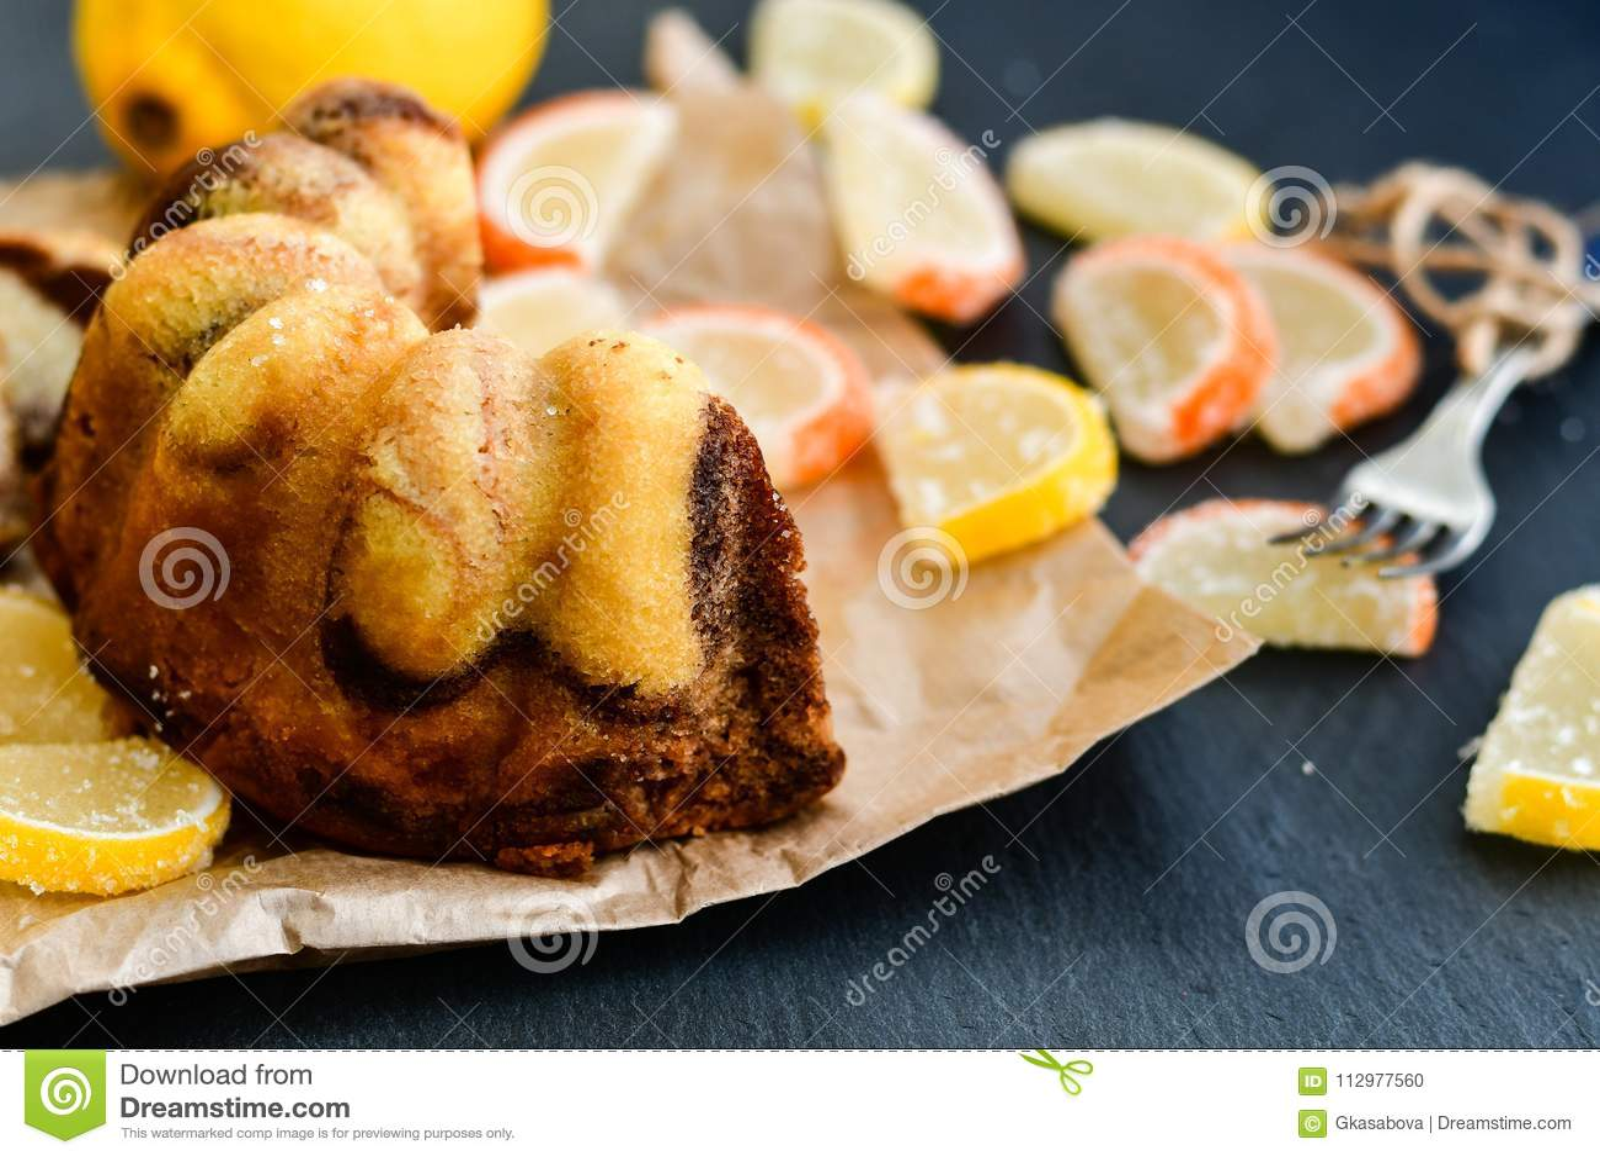 Bundt marble cake, and lemon slices